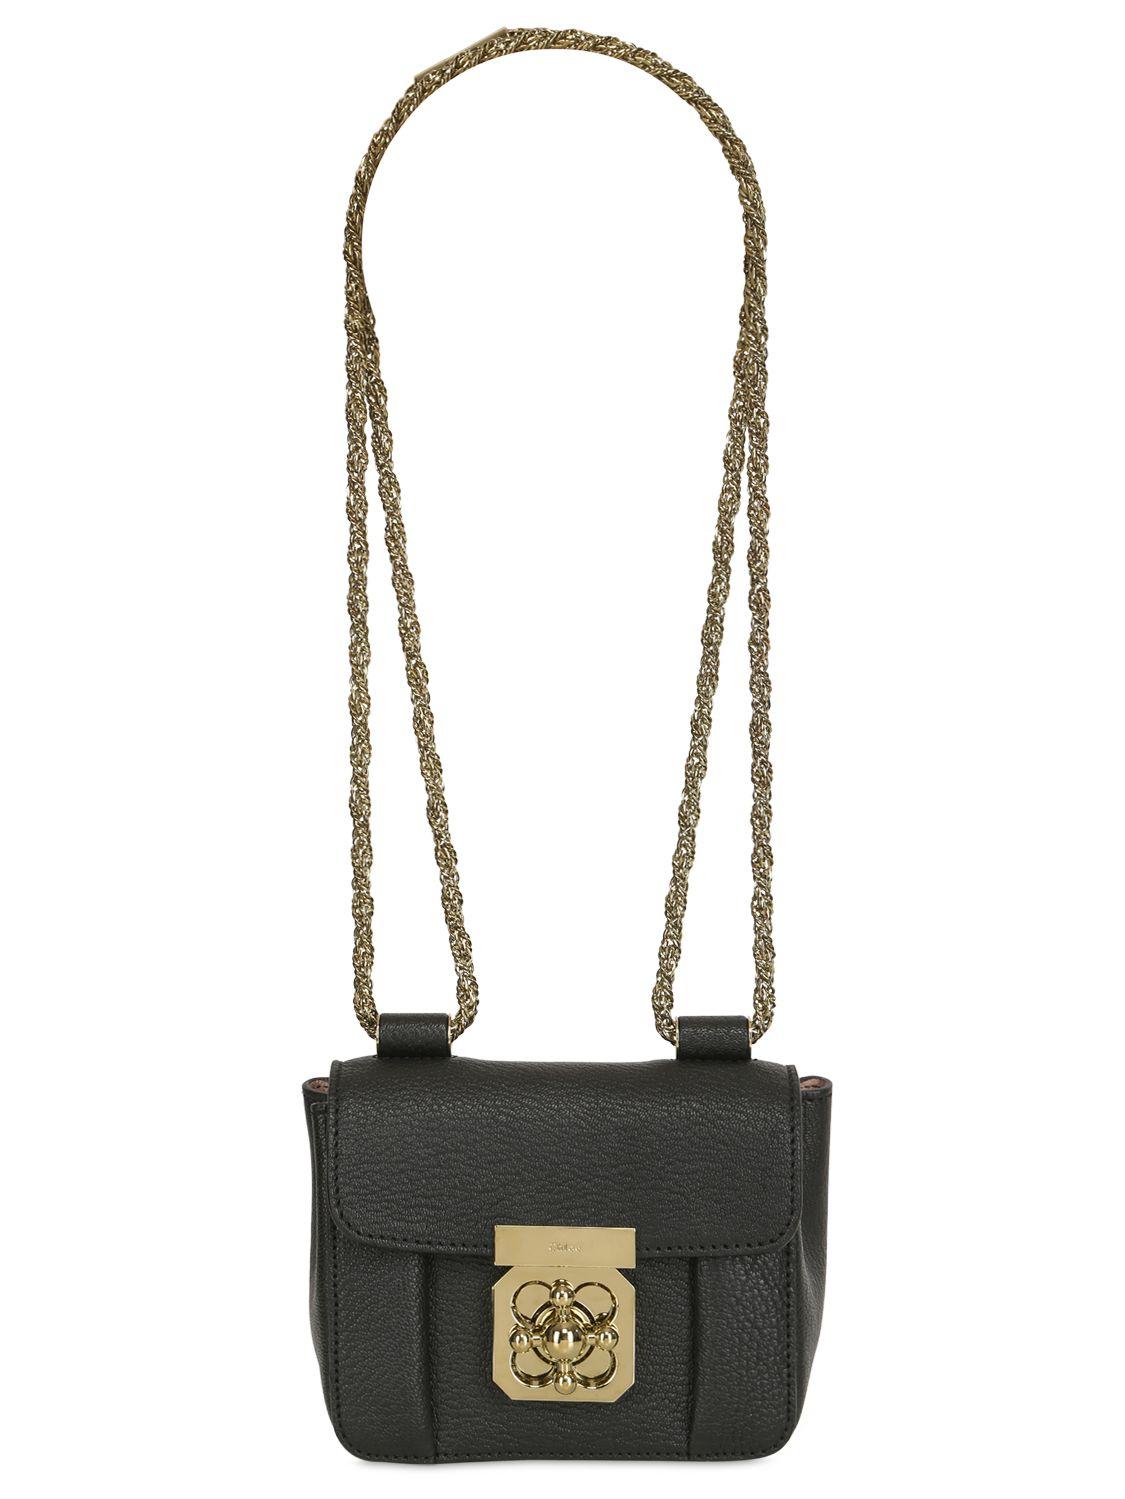 elsie bag in grained leather